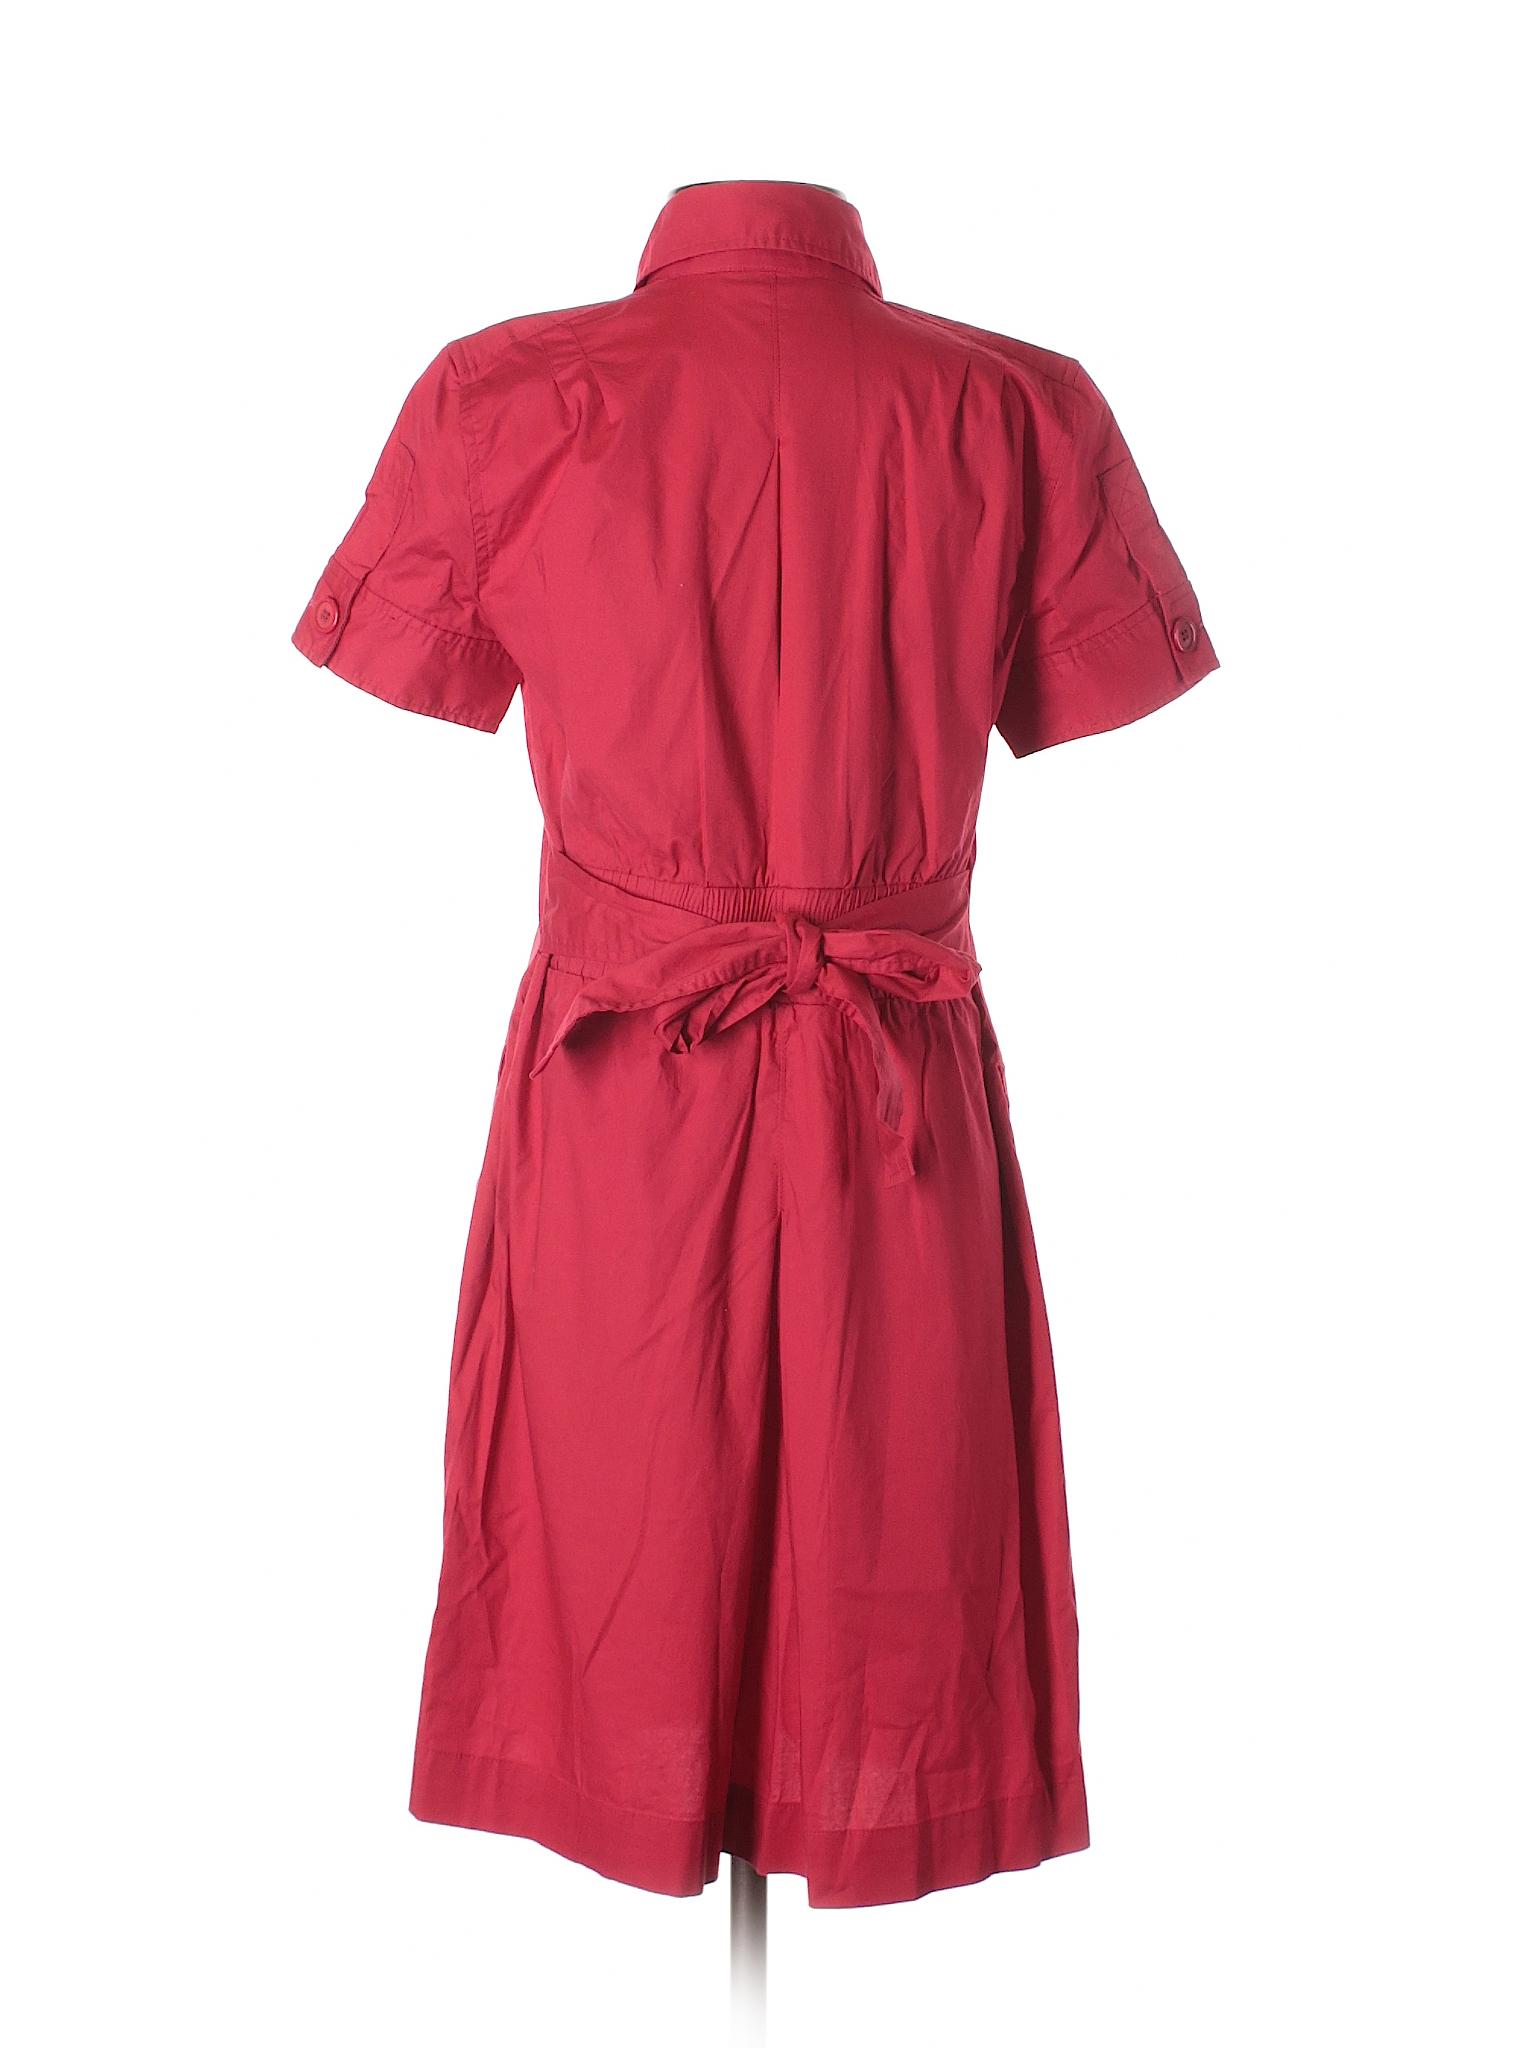 International Boutique Casual Dress Concepts Winter Inc Eqqwx70z1